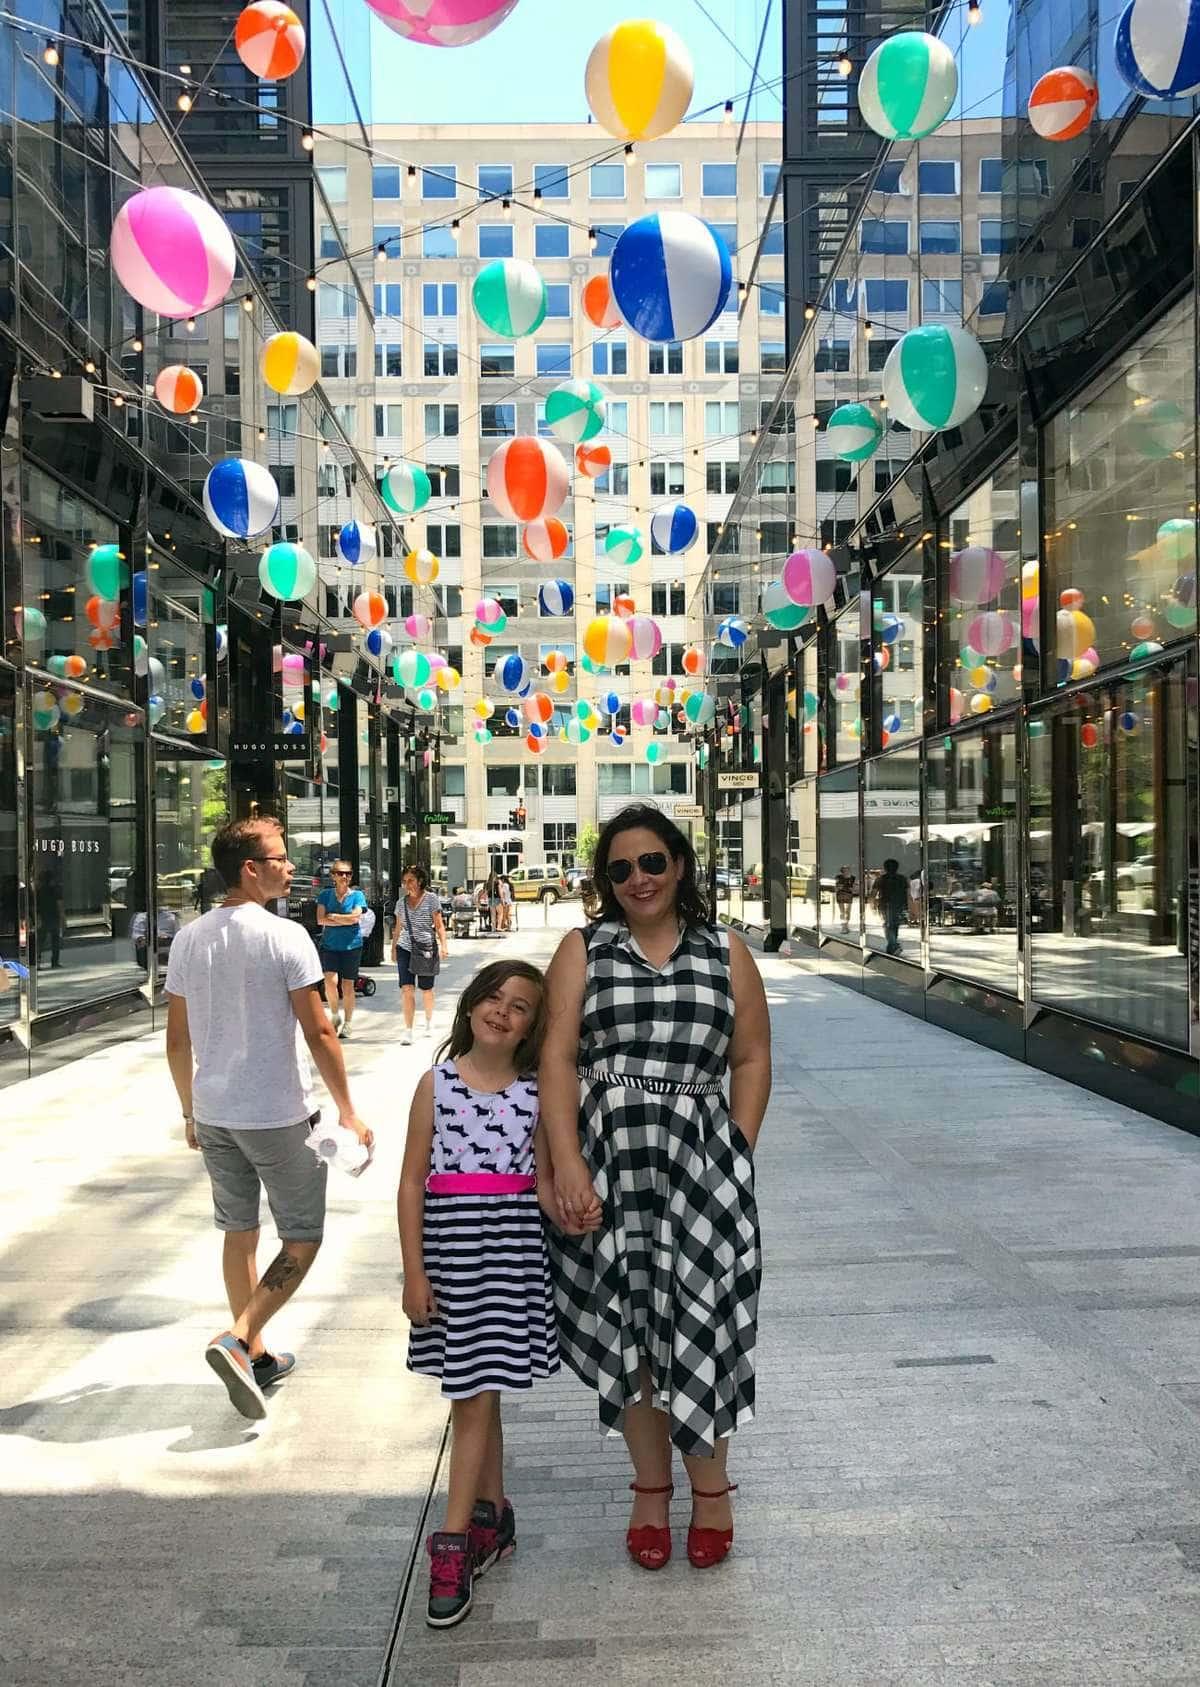 CityCenter Washington DC review